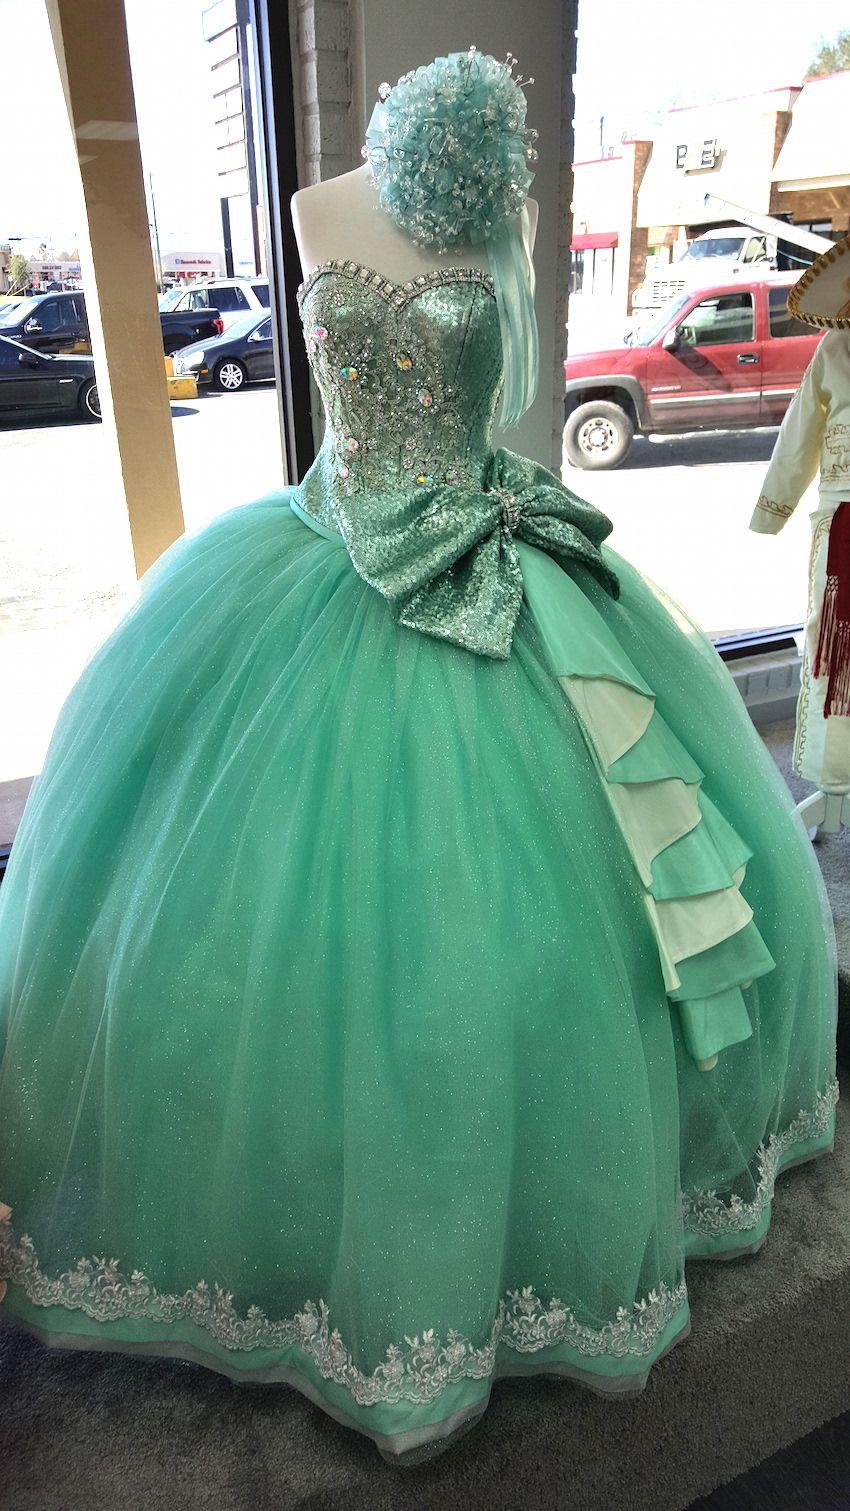 bellas xv san antonio quince dress | 15 ano dresses | Pinterest ...